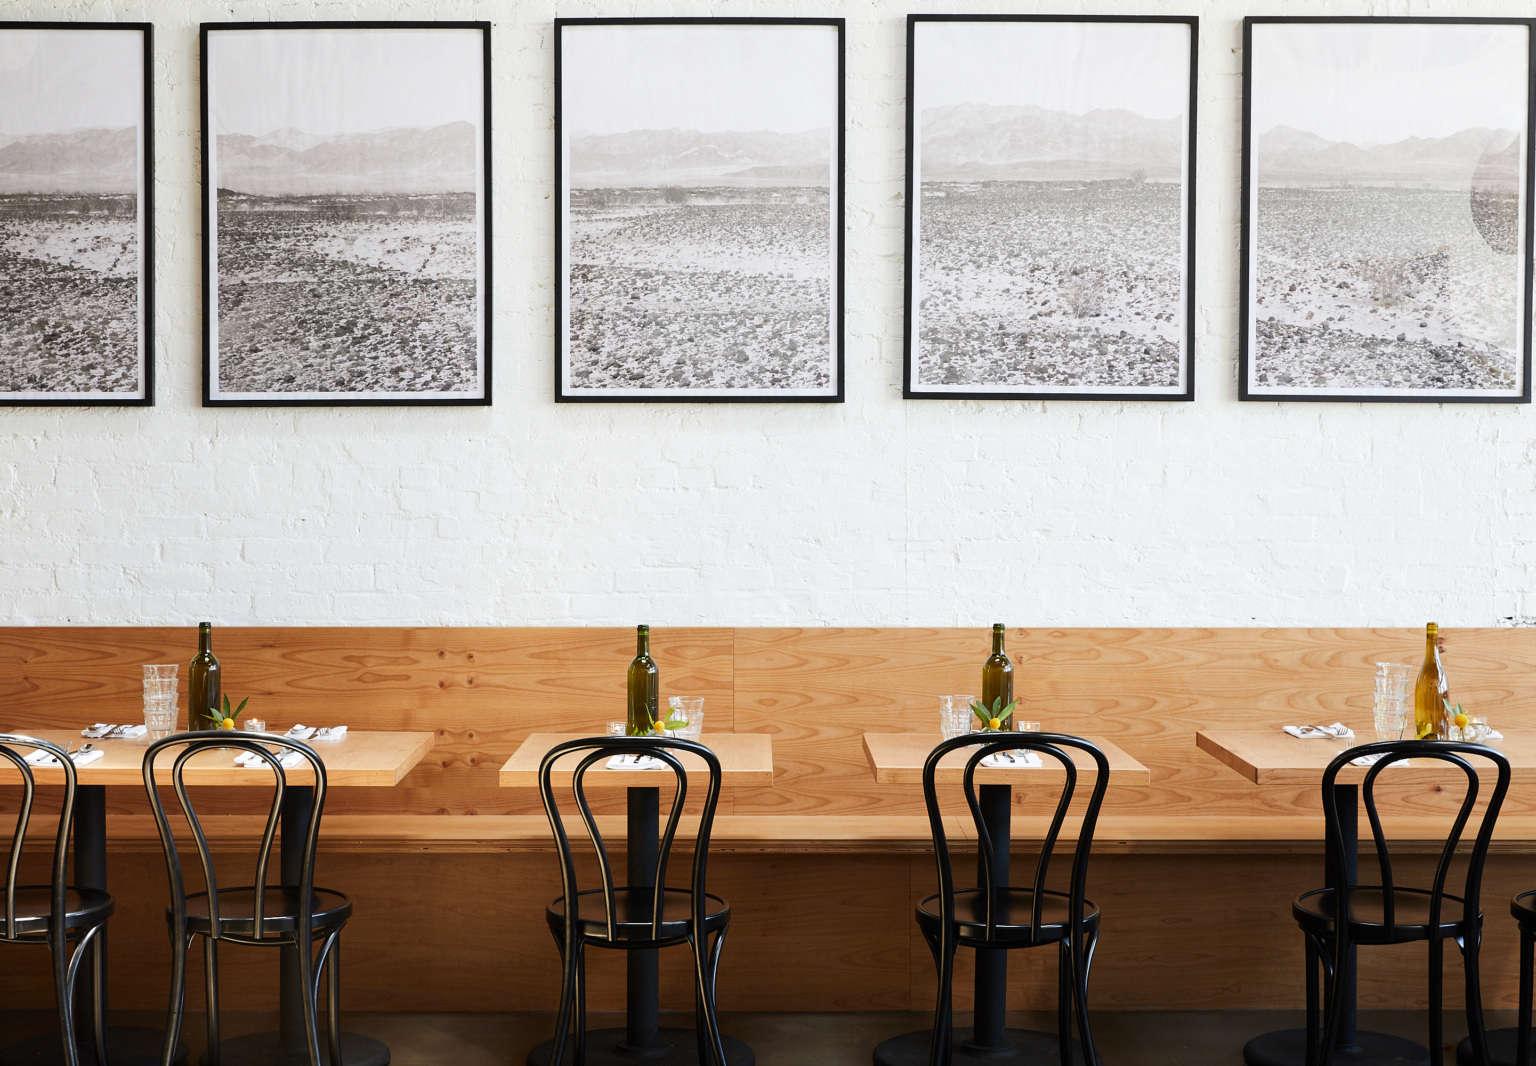 range life banquette nicole franzen 1536x1066